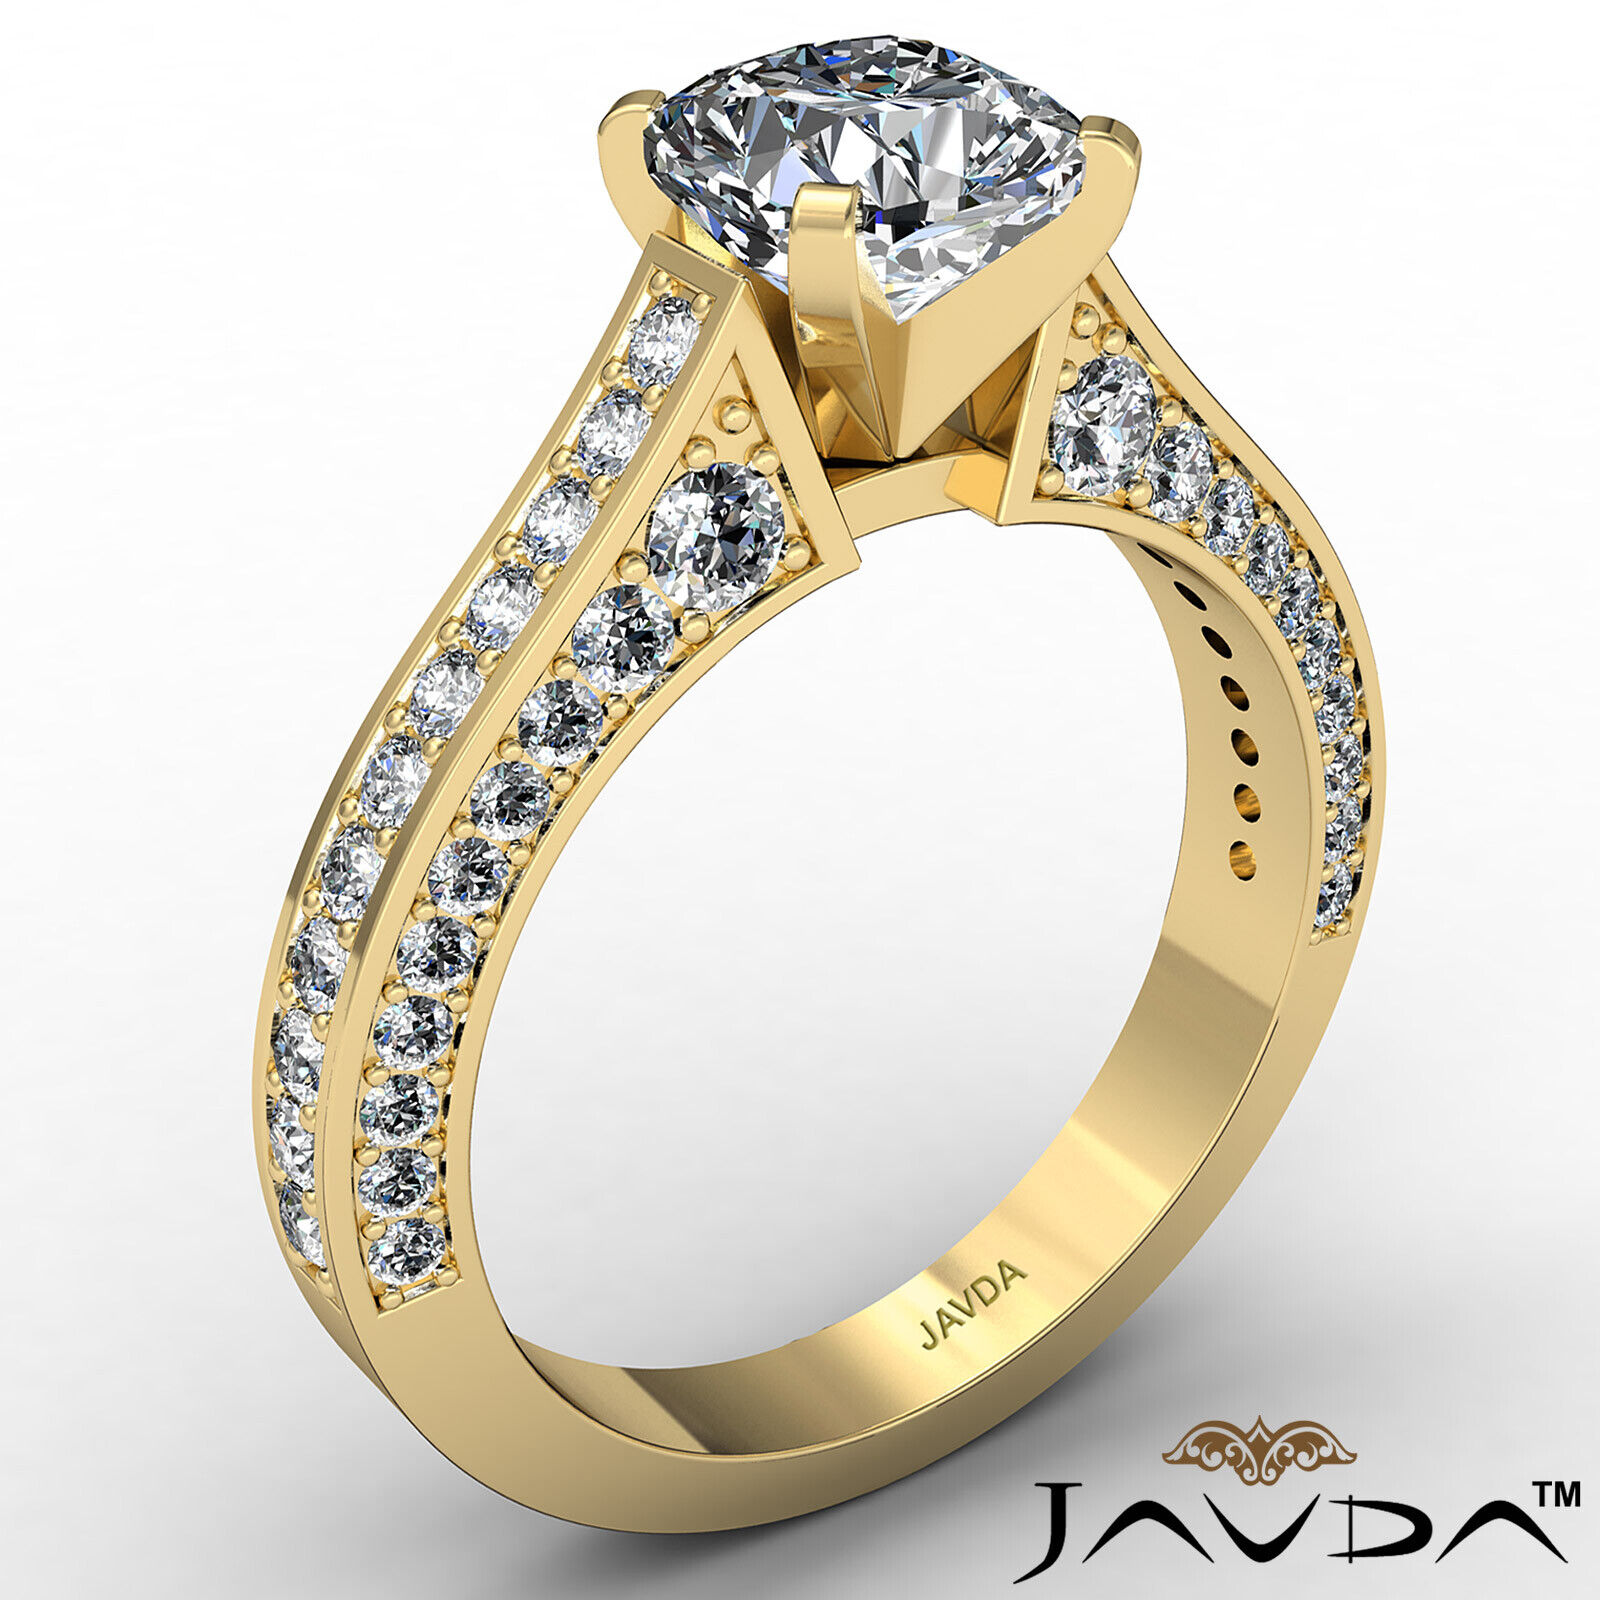 Cushion Diamond Engagement Pave Set Ring GIA J Color & VS2 clarity 1.82ctw 4